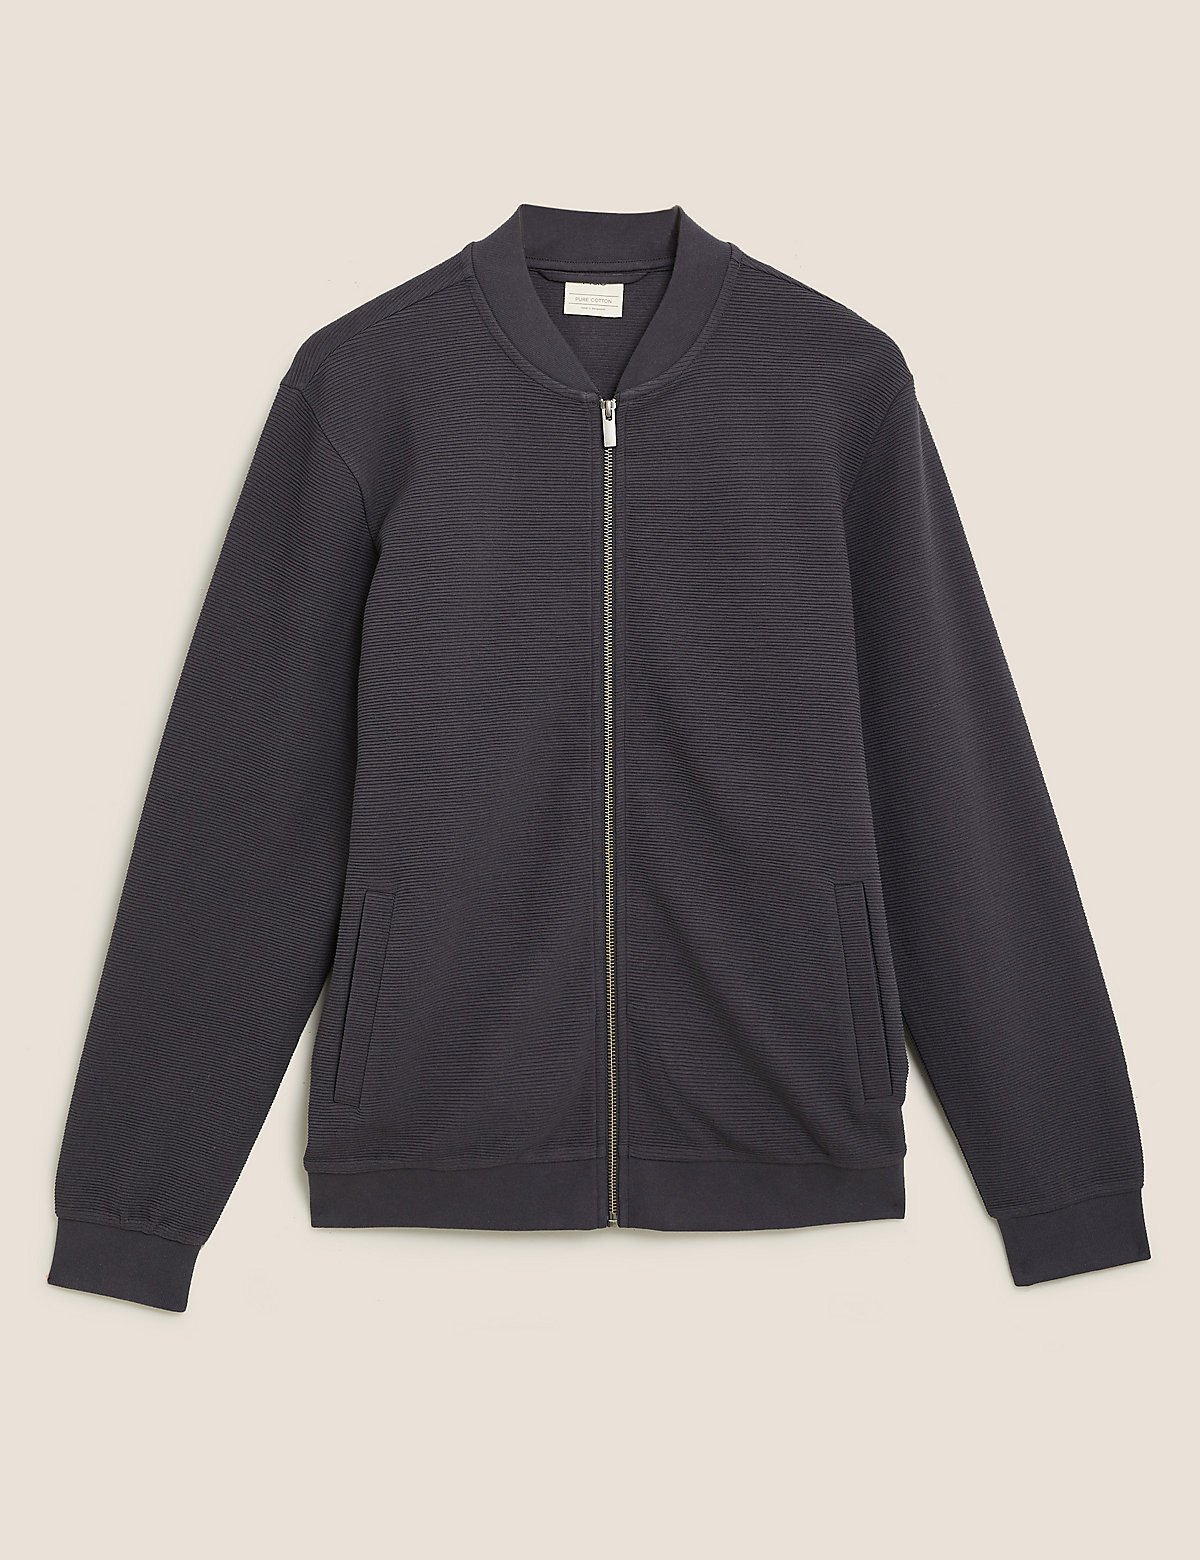 Куртка-бомбер фактурная из чистого хлопка